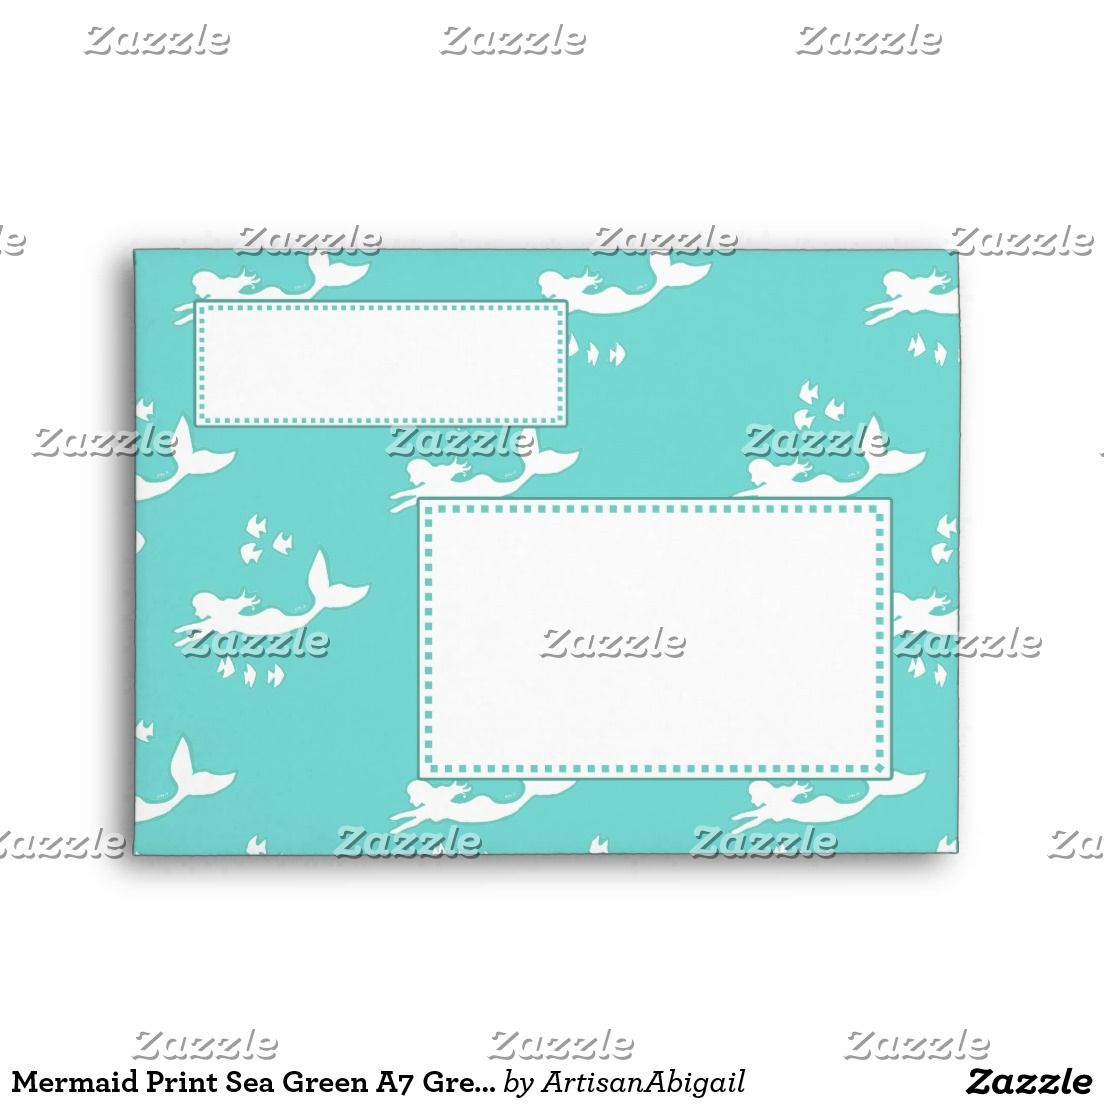 mermaid print sea green a7 greeting card envelopes envelopes